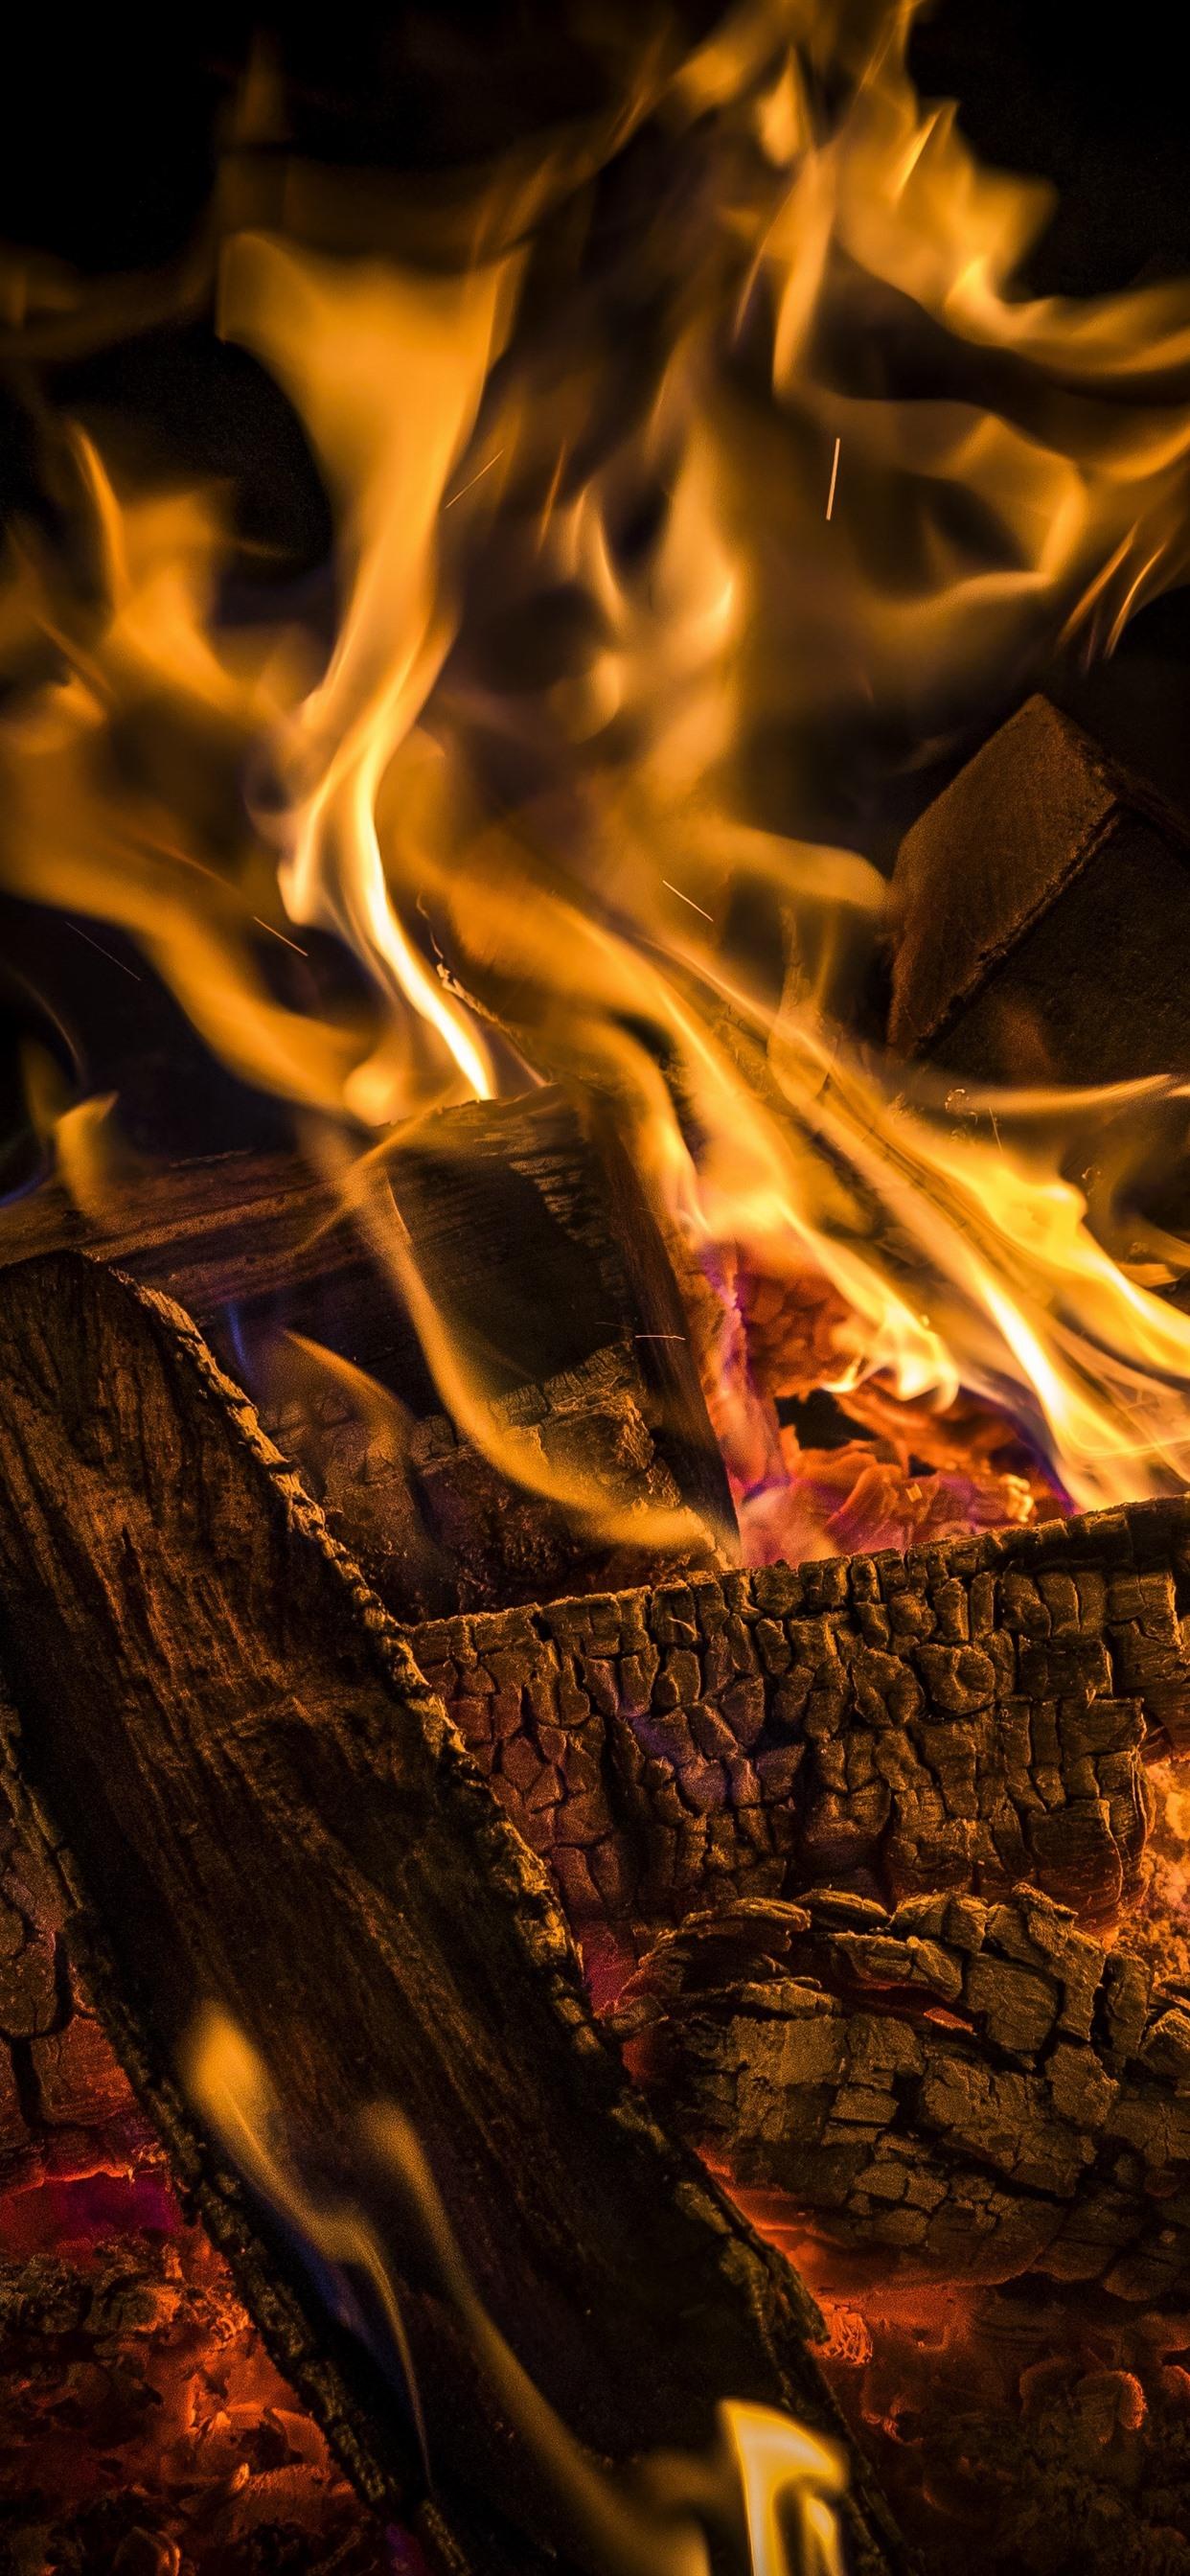 Firewood Fire Flame 1242x2688 Iphone Xs Max Wallpaper